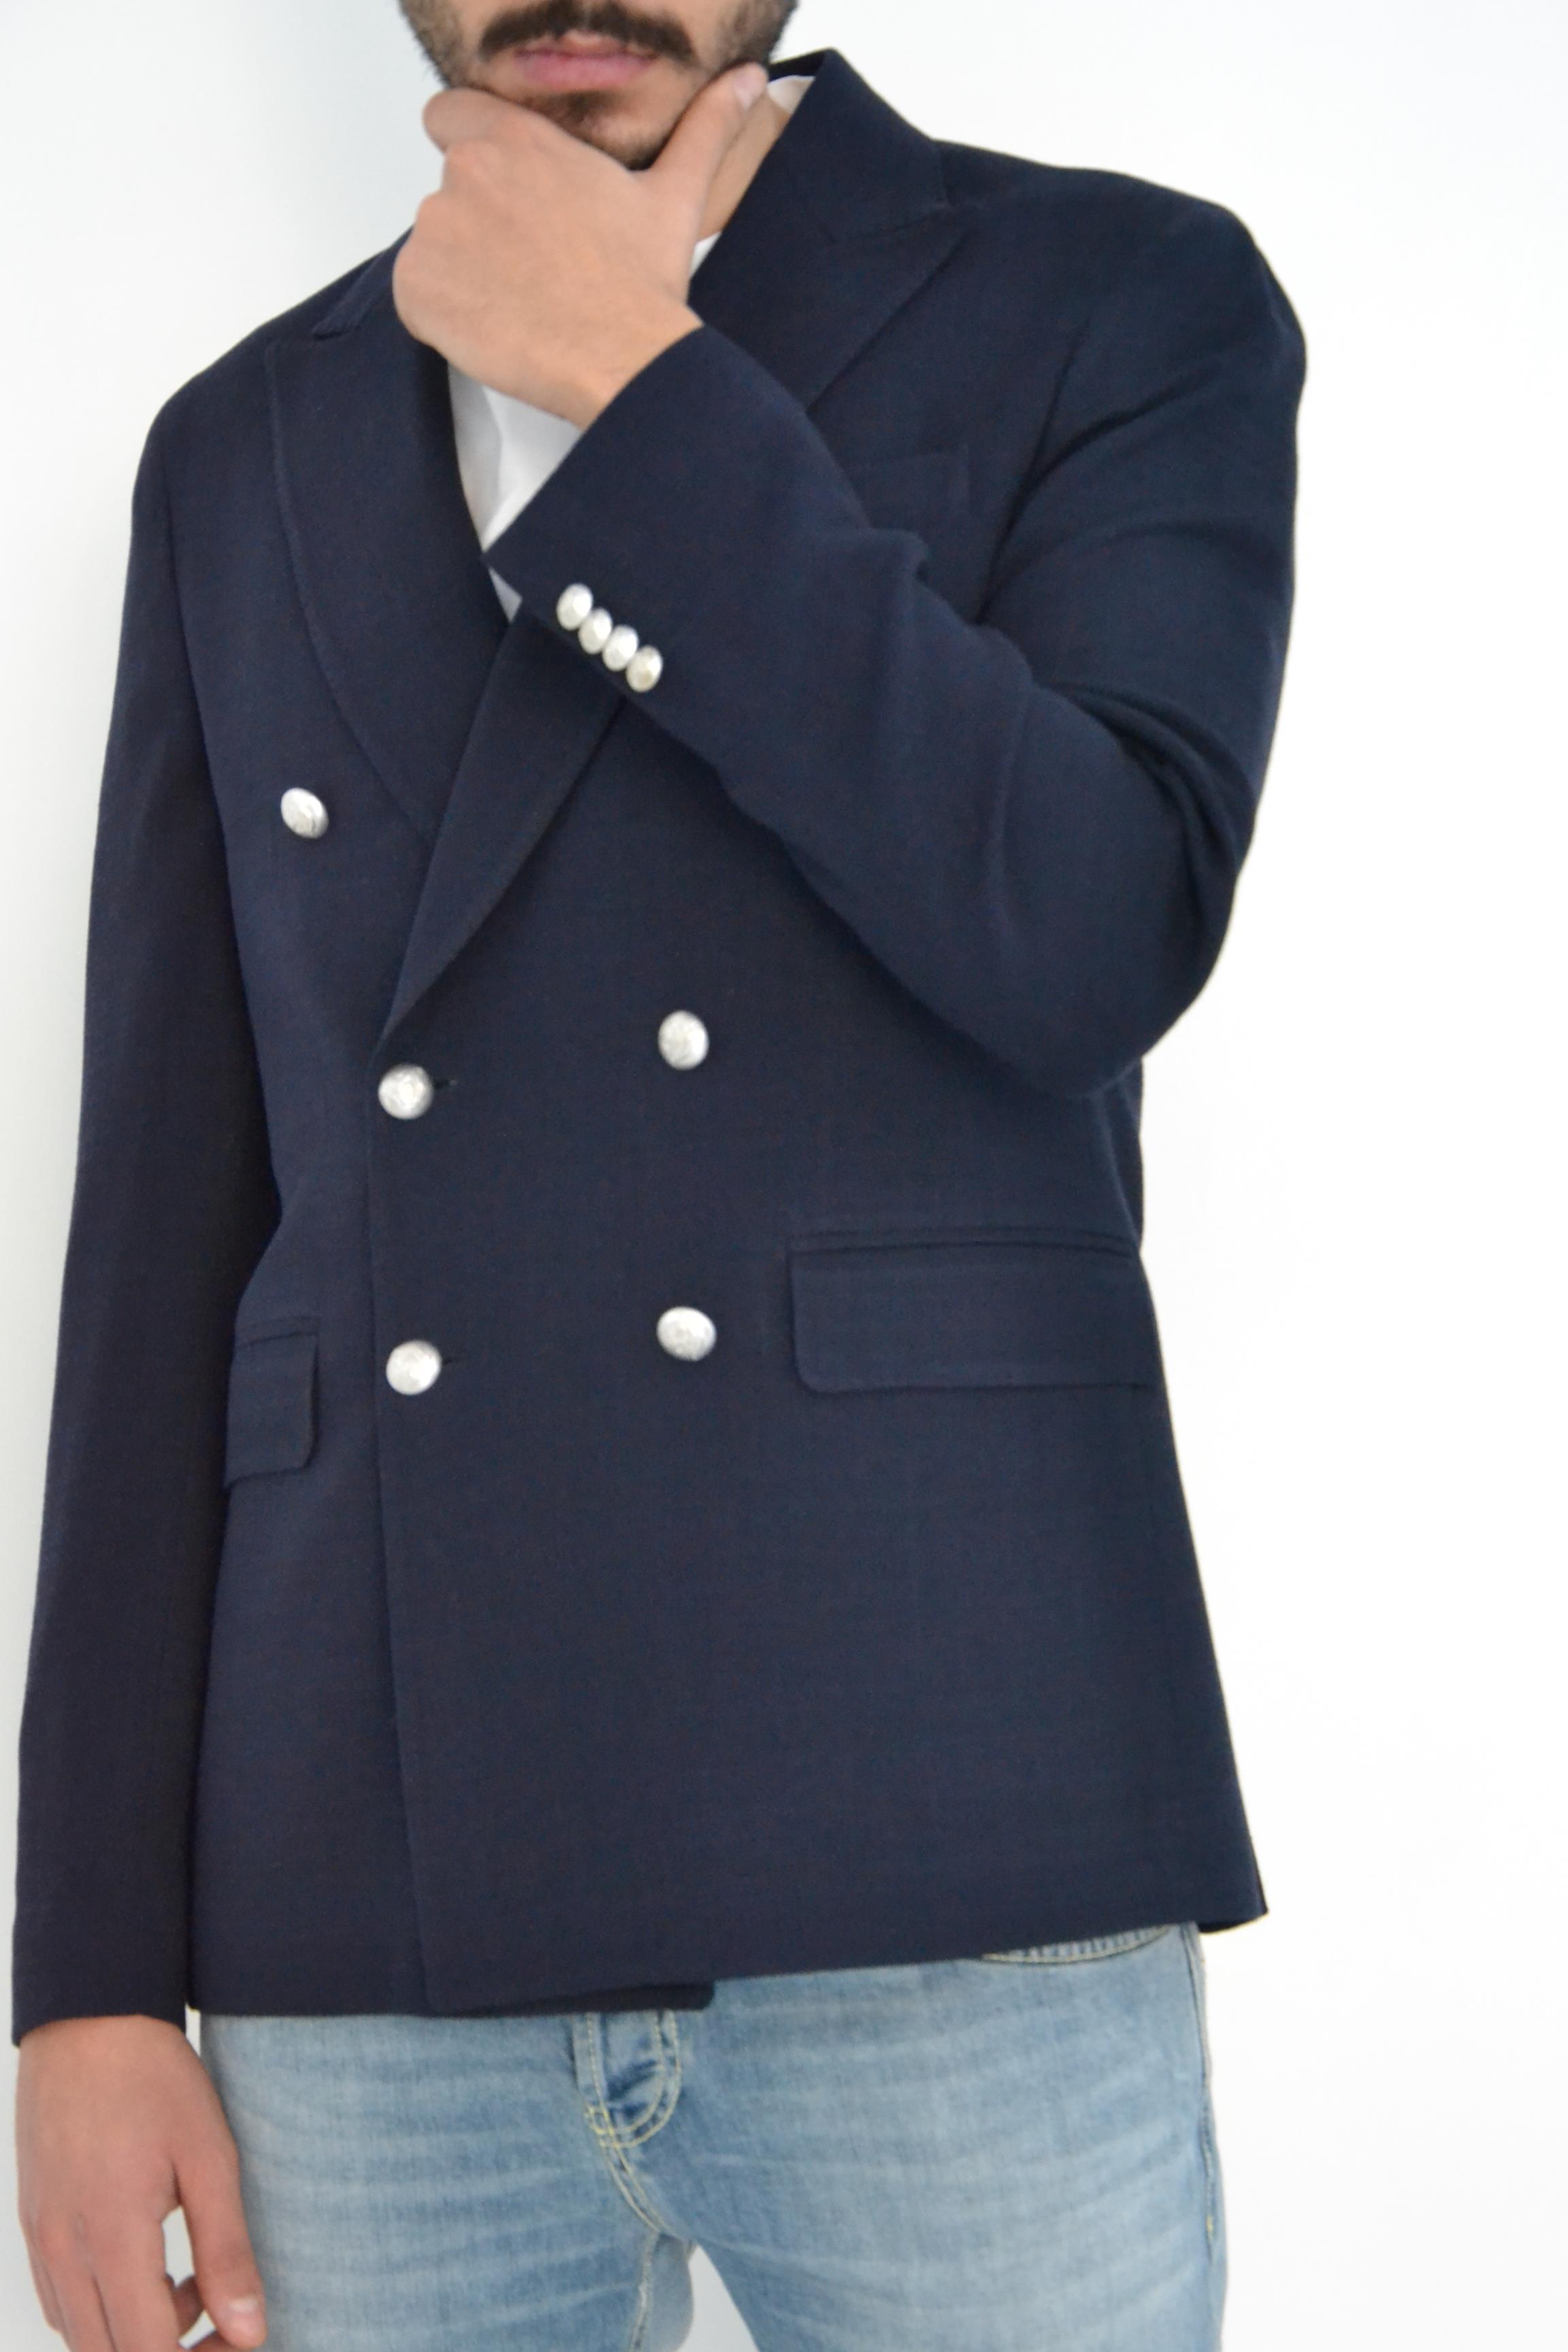 Brian Dales Giacca doppio petto blu navy BRIAN DALES   3   G43JK4554001